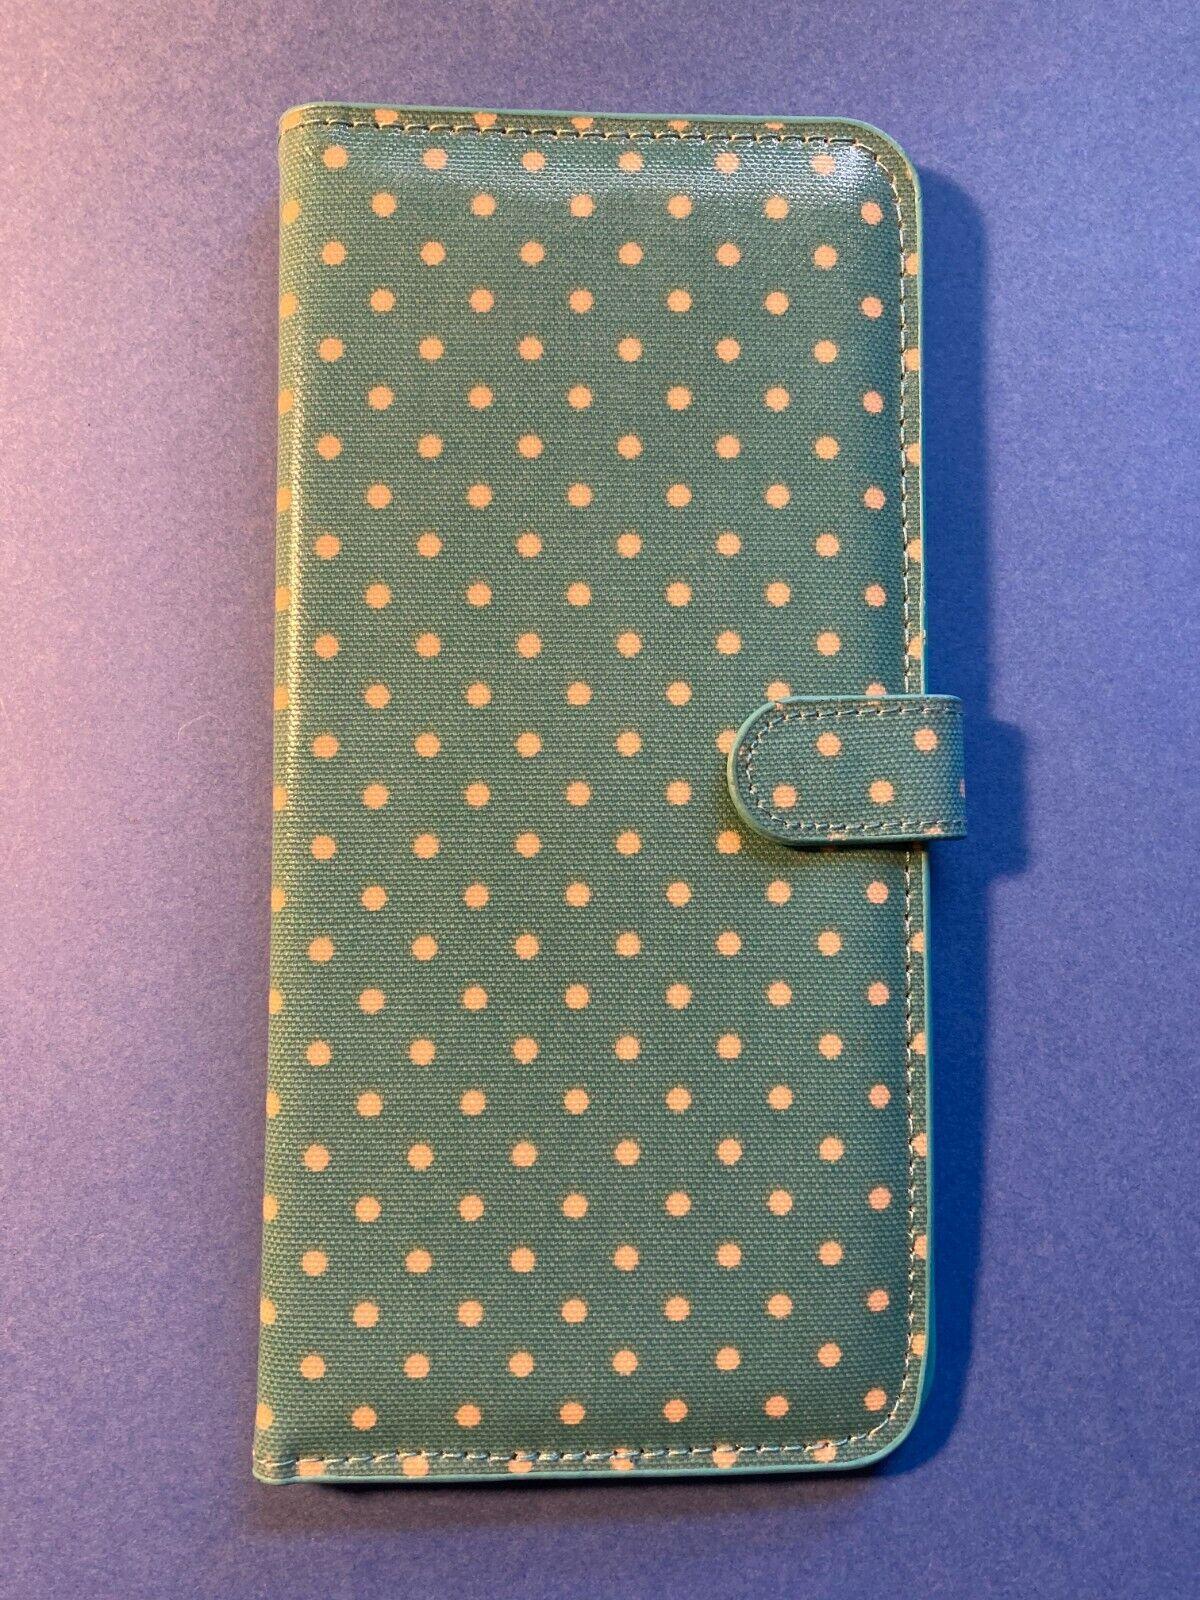 Cath Kidston Travel Document Wallet Passport Sleeve - Light Grey Ditsy Floral